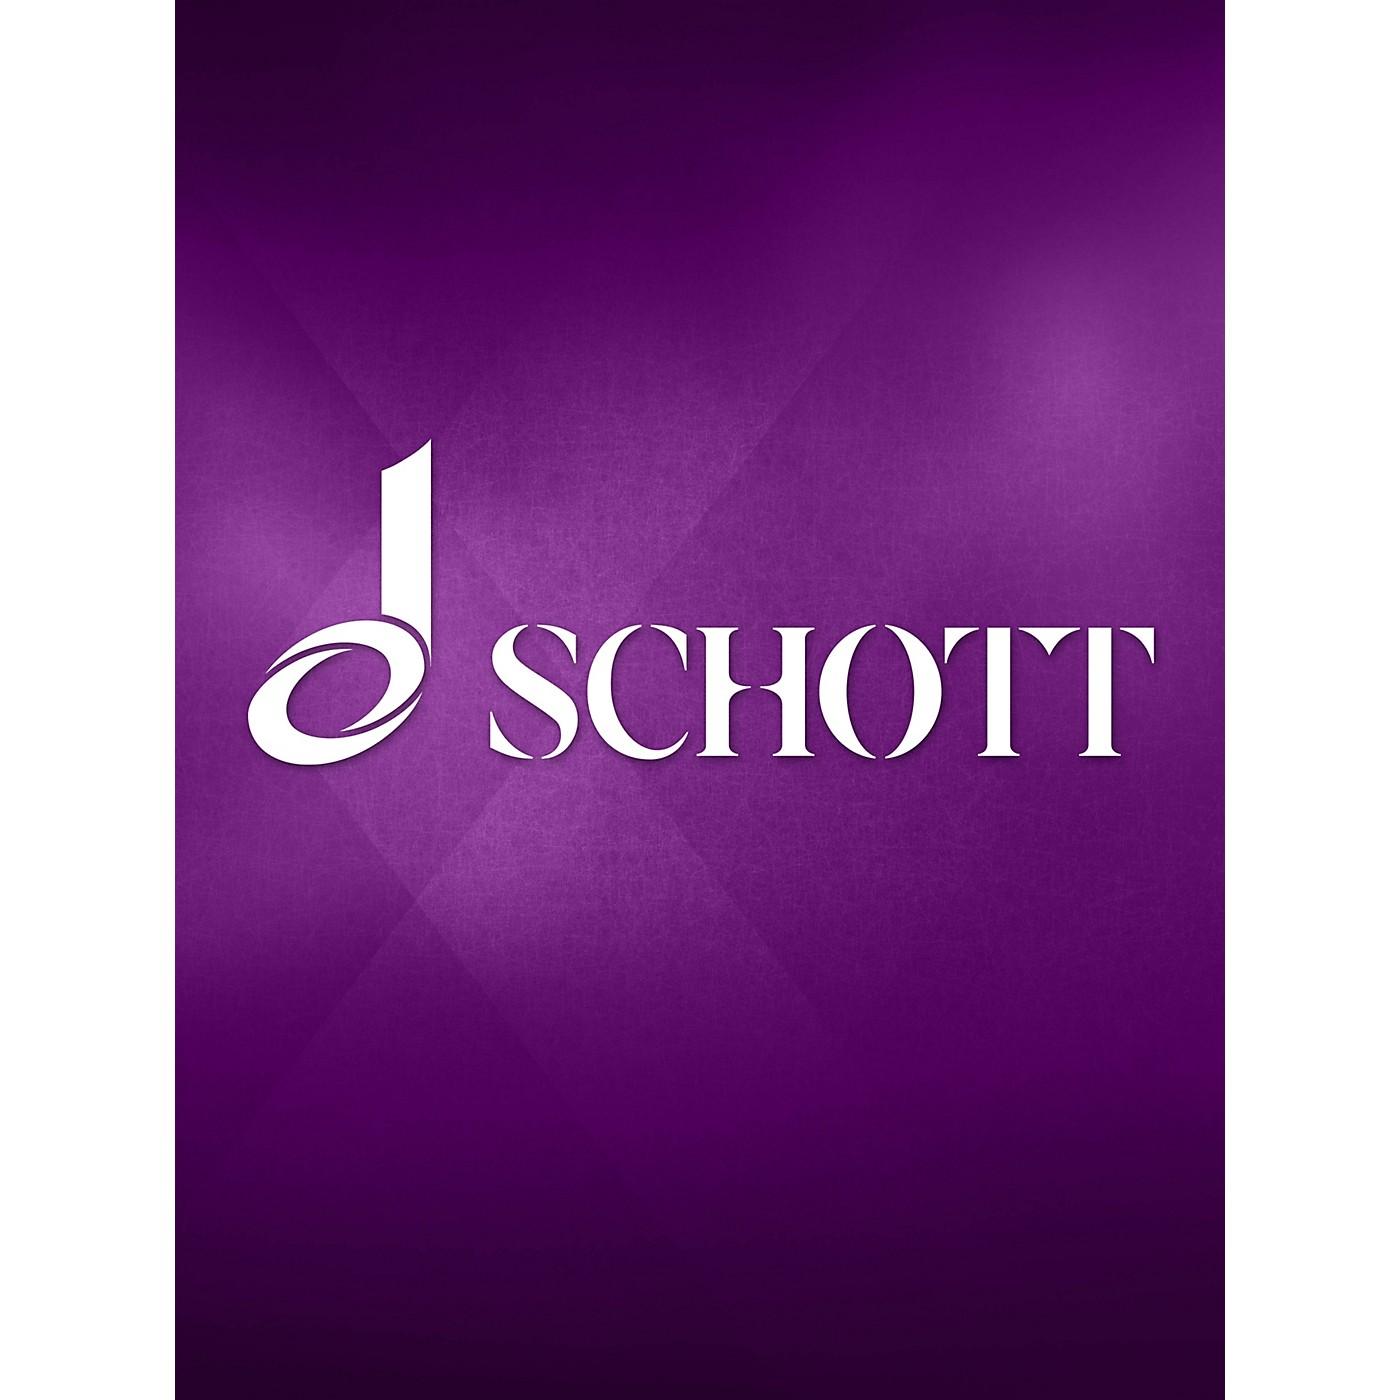 Eulenburg String Quartet in G Minor, Op. 27 (Study Score) Schott Series Composed by Edvard Grieg thumbnail